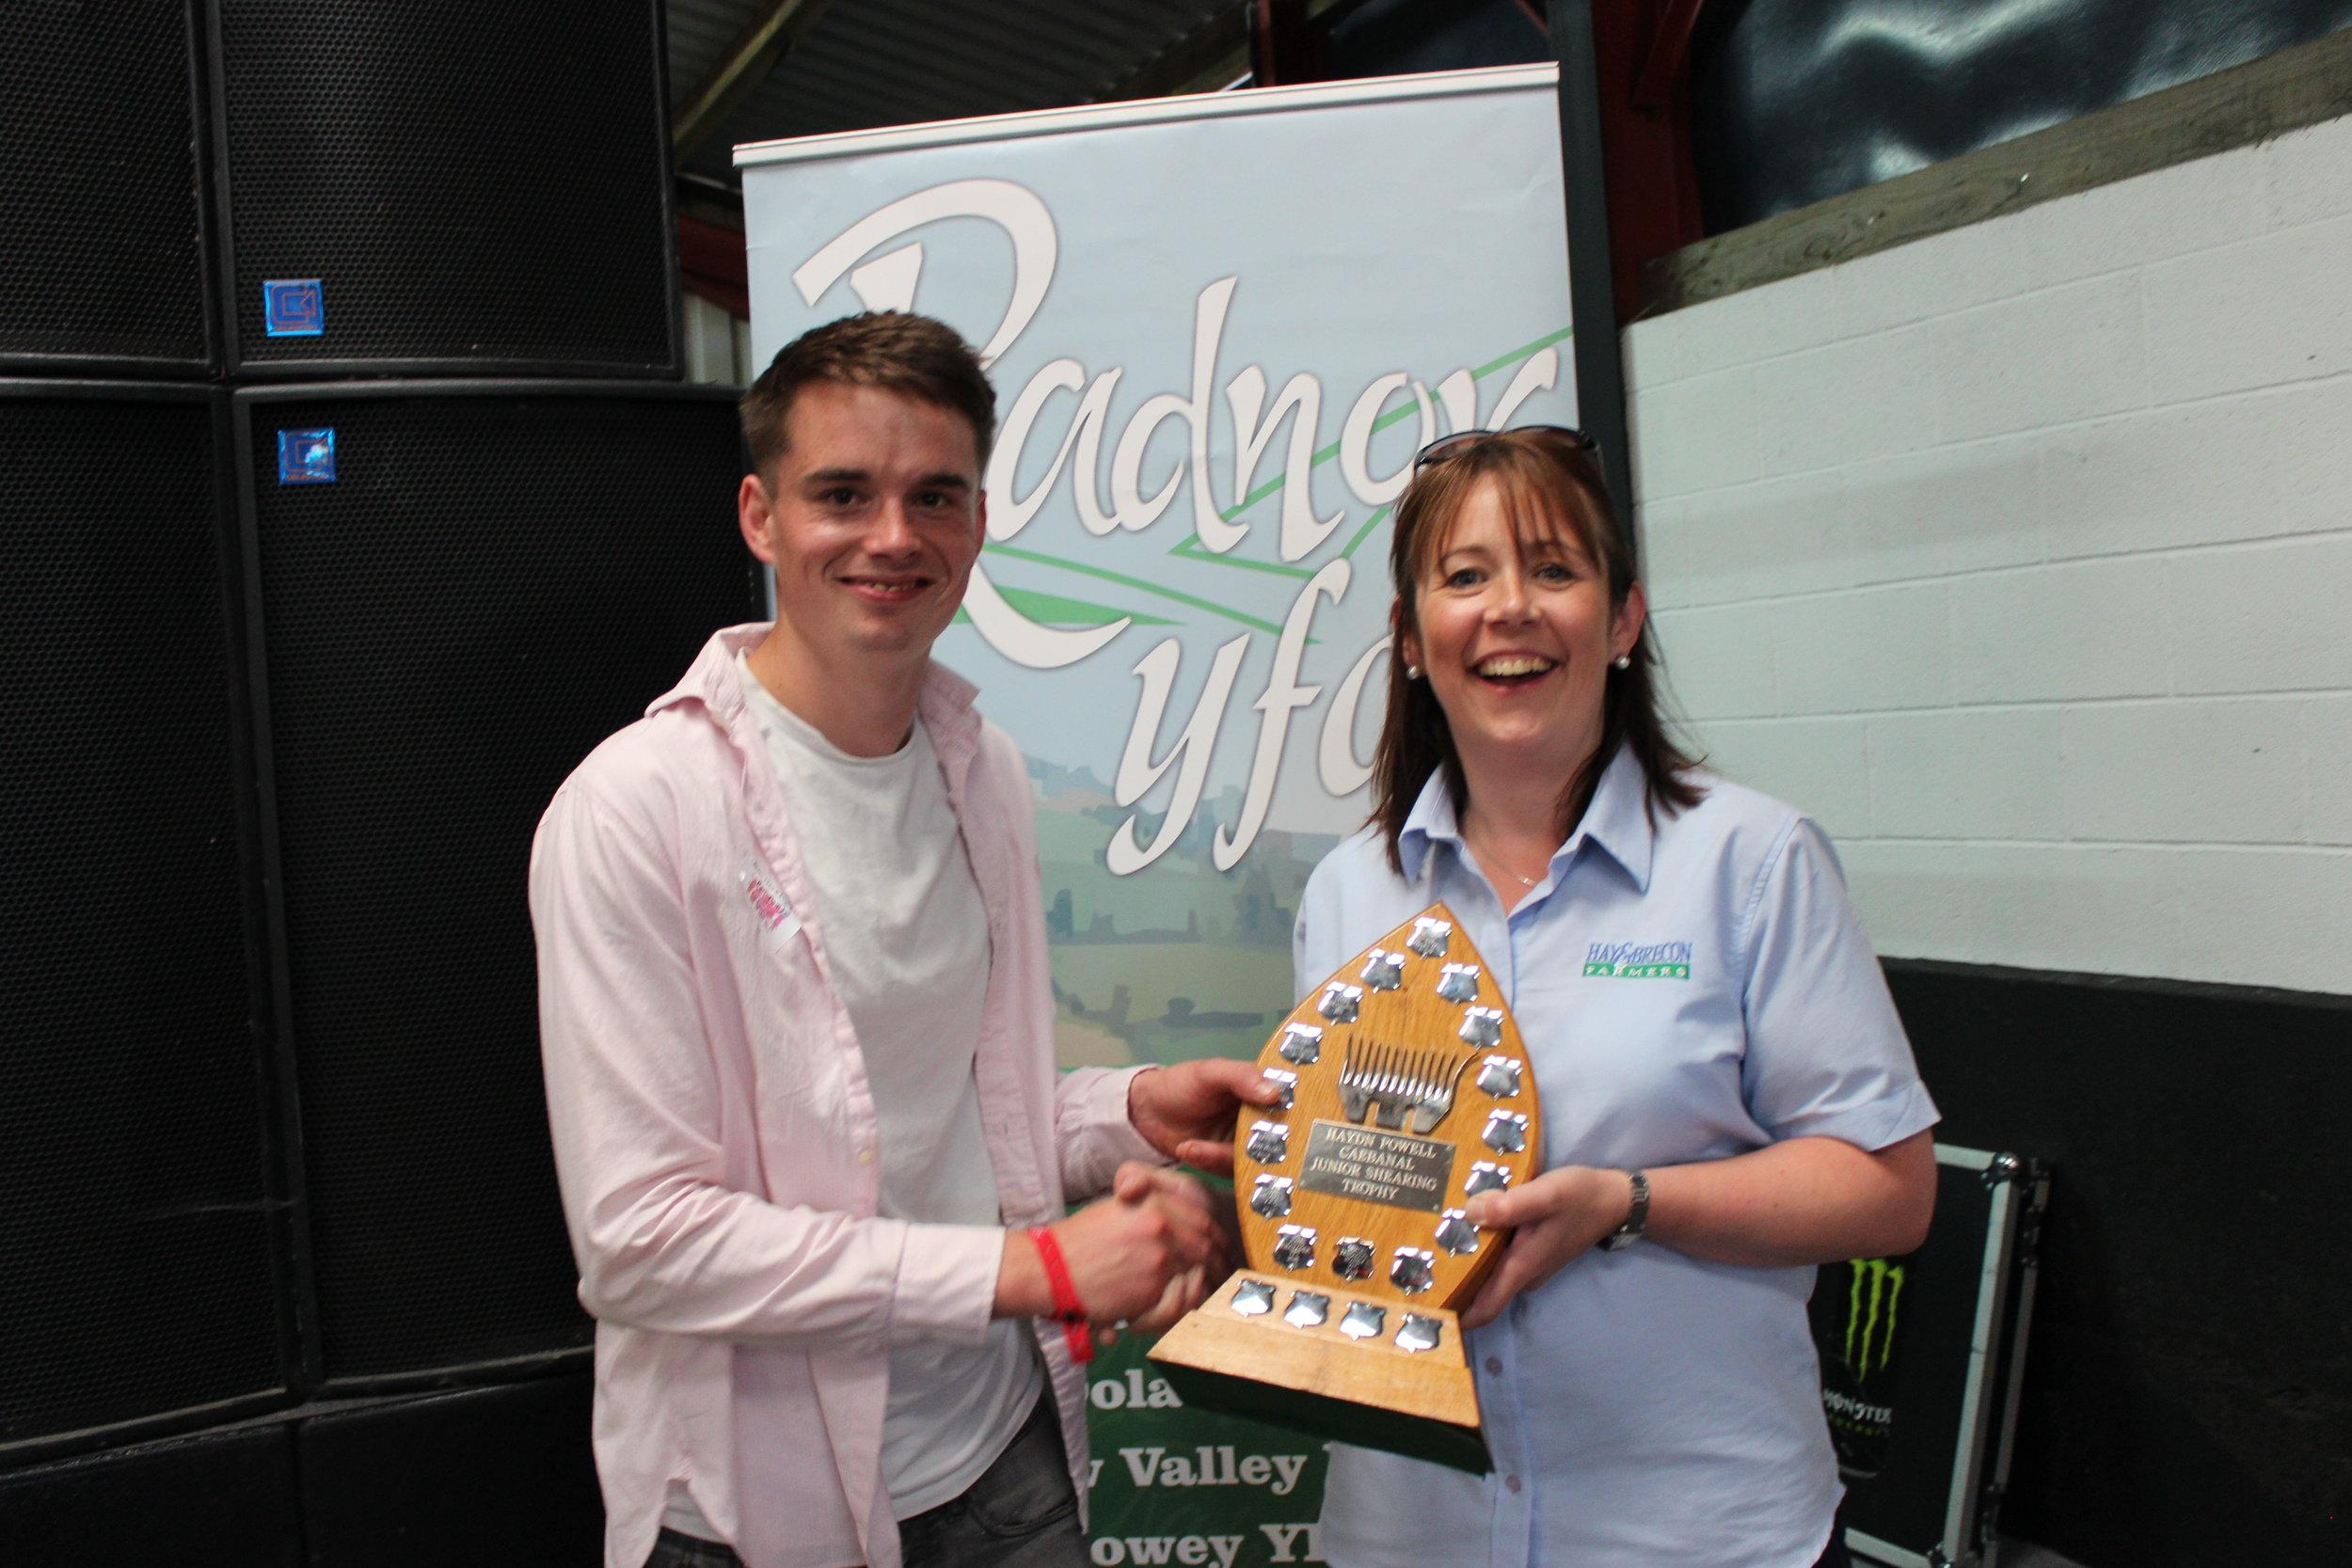 Ed Hamer on behalf of Philip Price, Radnor Valley YFC - Haydn Powell Trophy  / Junior Shearing Competition